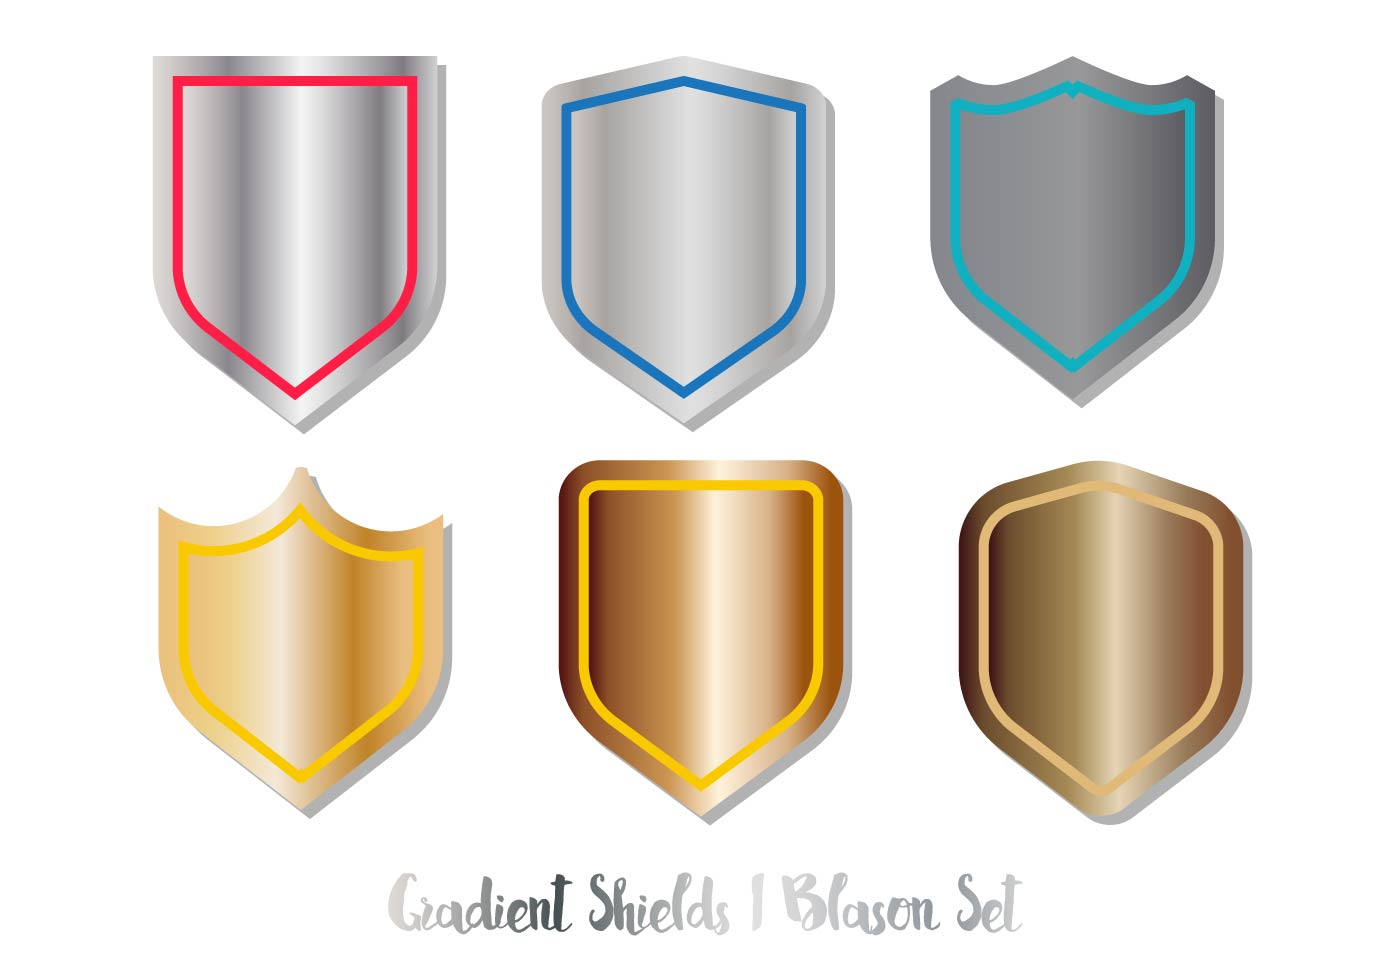 blason shield vector set gradient